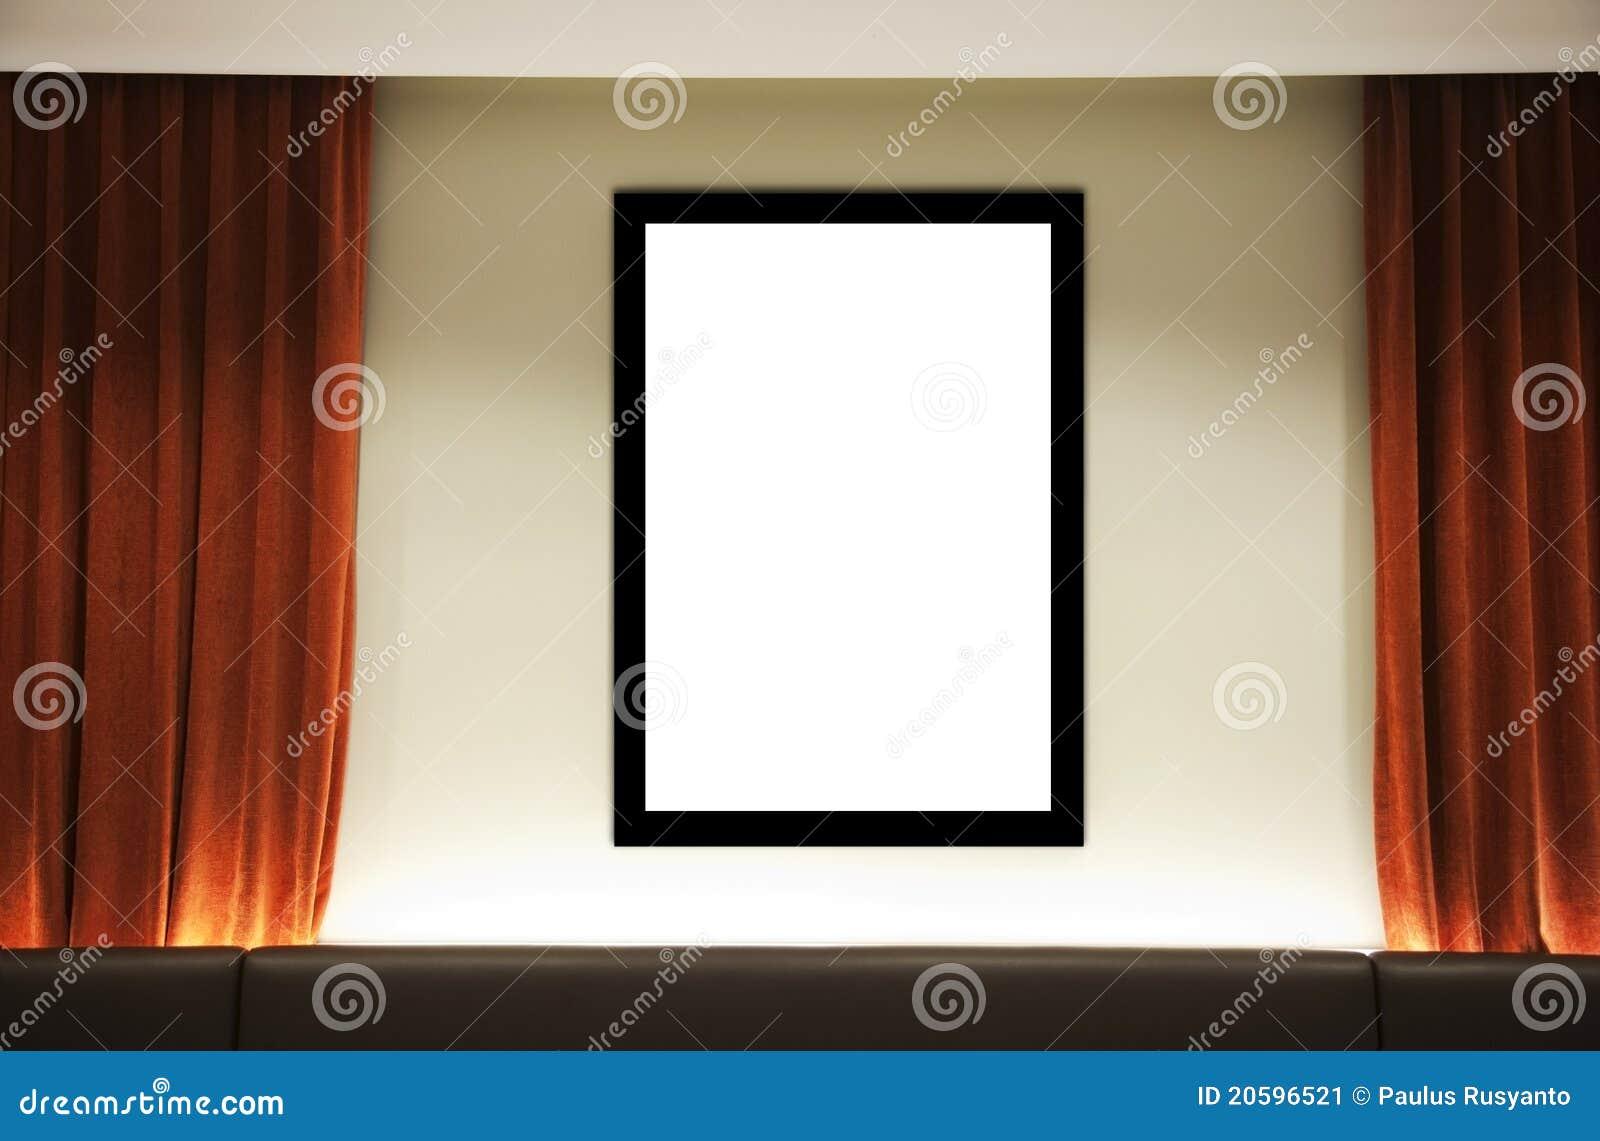 Trame Blanc Avec Le Rideau Orange Image Stock Image Du Fond Trame